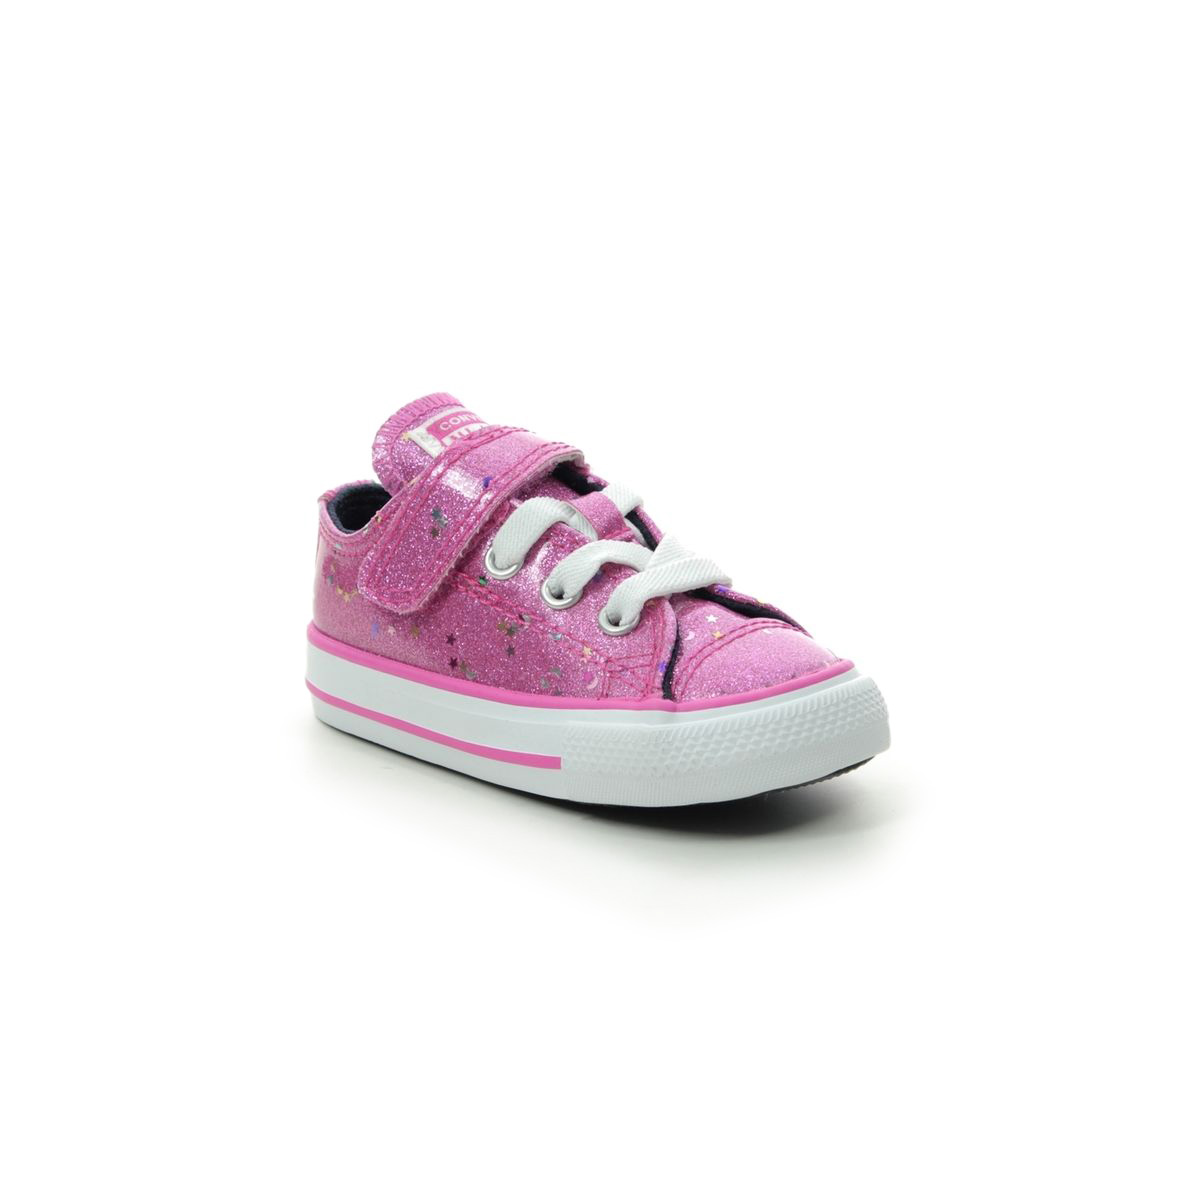 Converse Sparkle 1v 765110C-006 Pink